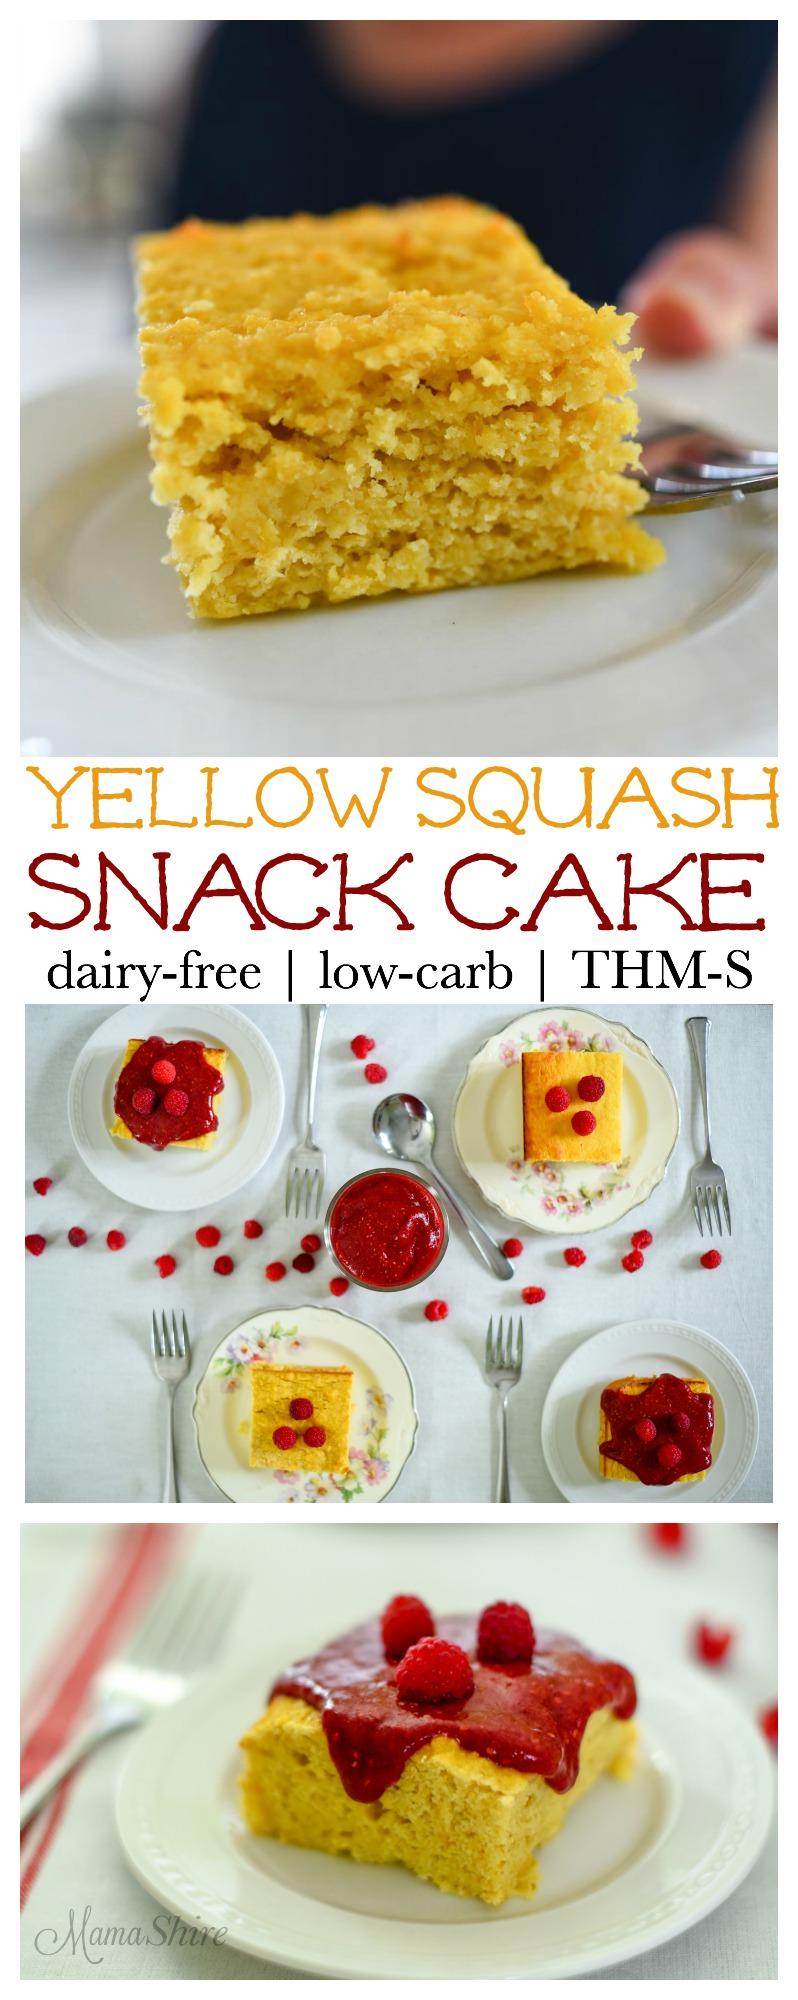 Yellow Squash Snack Cake - Gluten-free, Dairy-free, THM-S